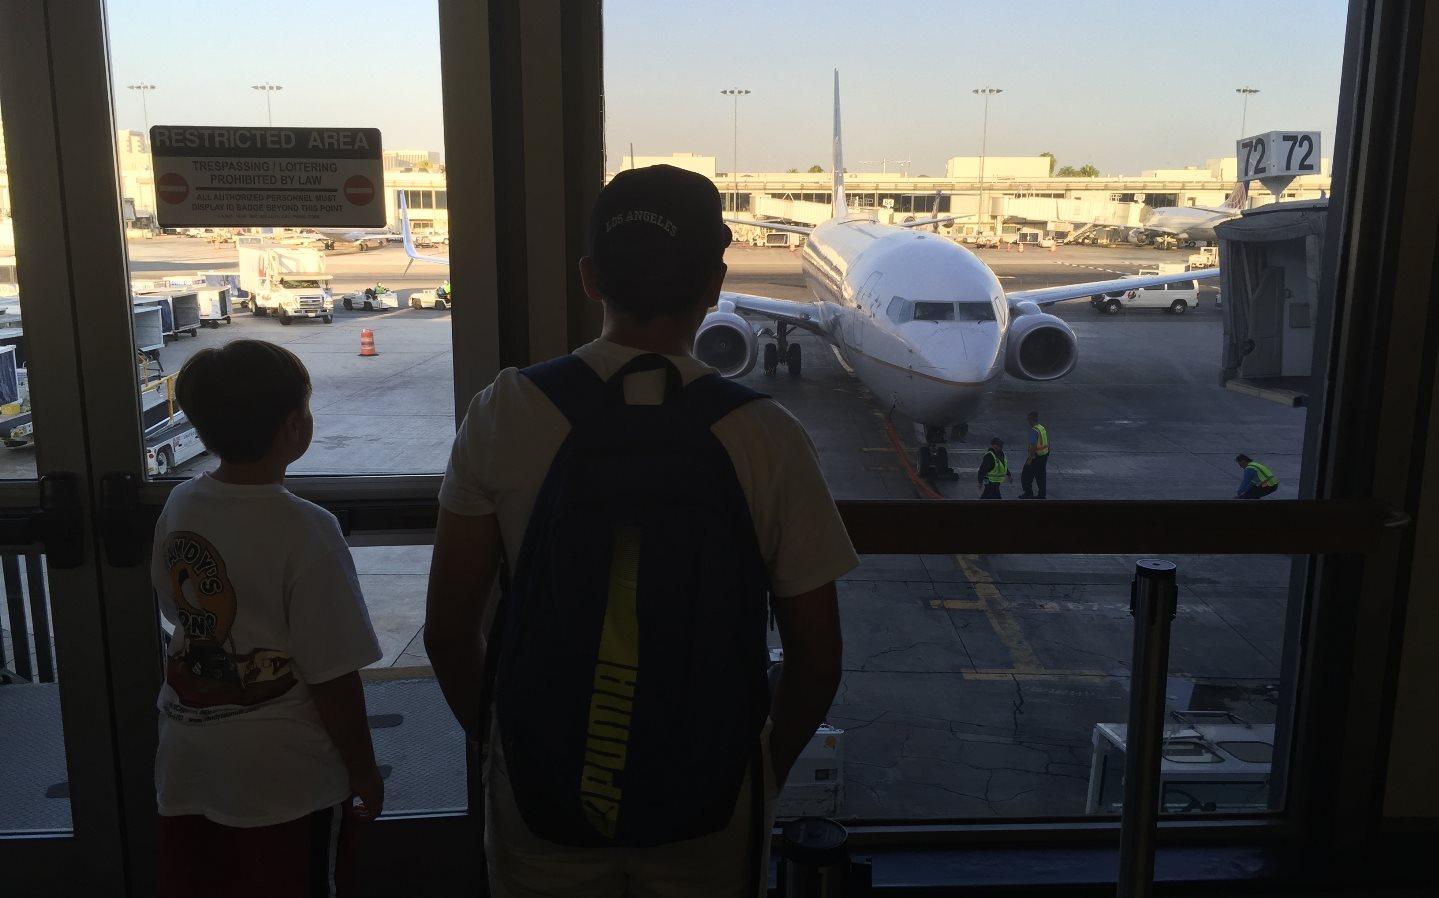 2016 Los Angeles, California, Airport